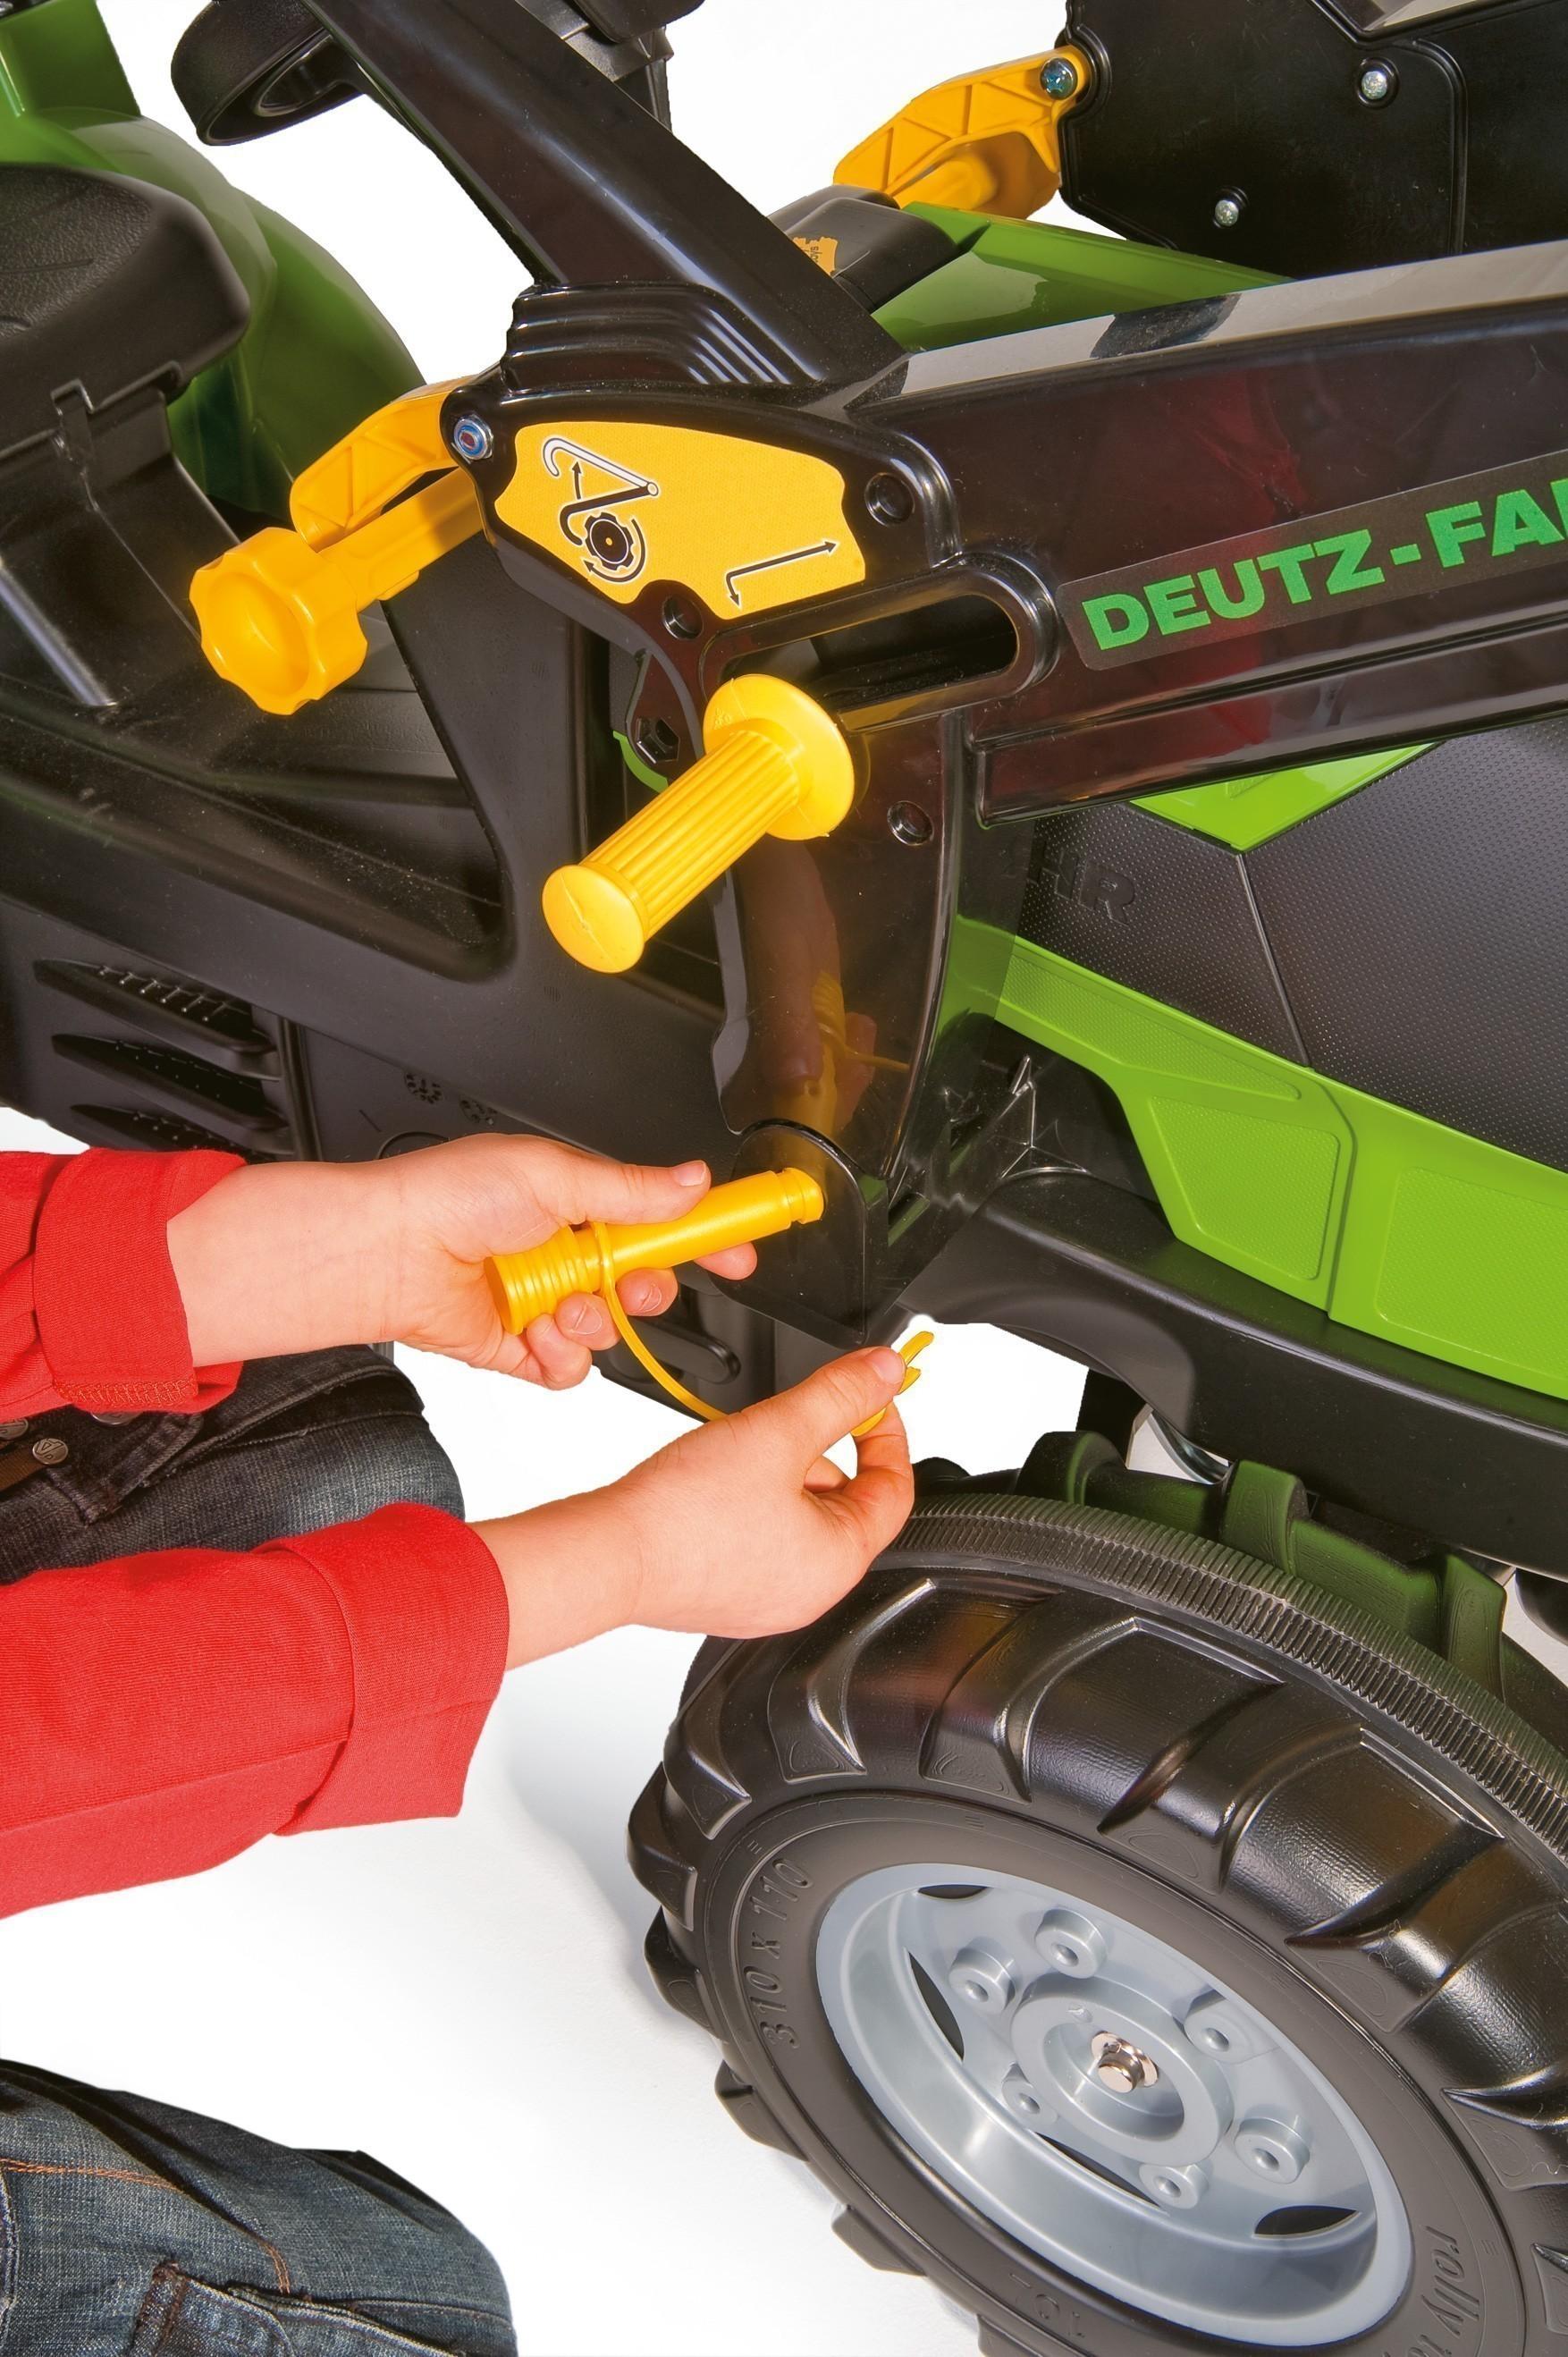 Trettraktor rolly Farmtrac Deutz-Fahr Agrotron Frontlader - Rolly Toys Bild 2